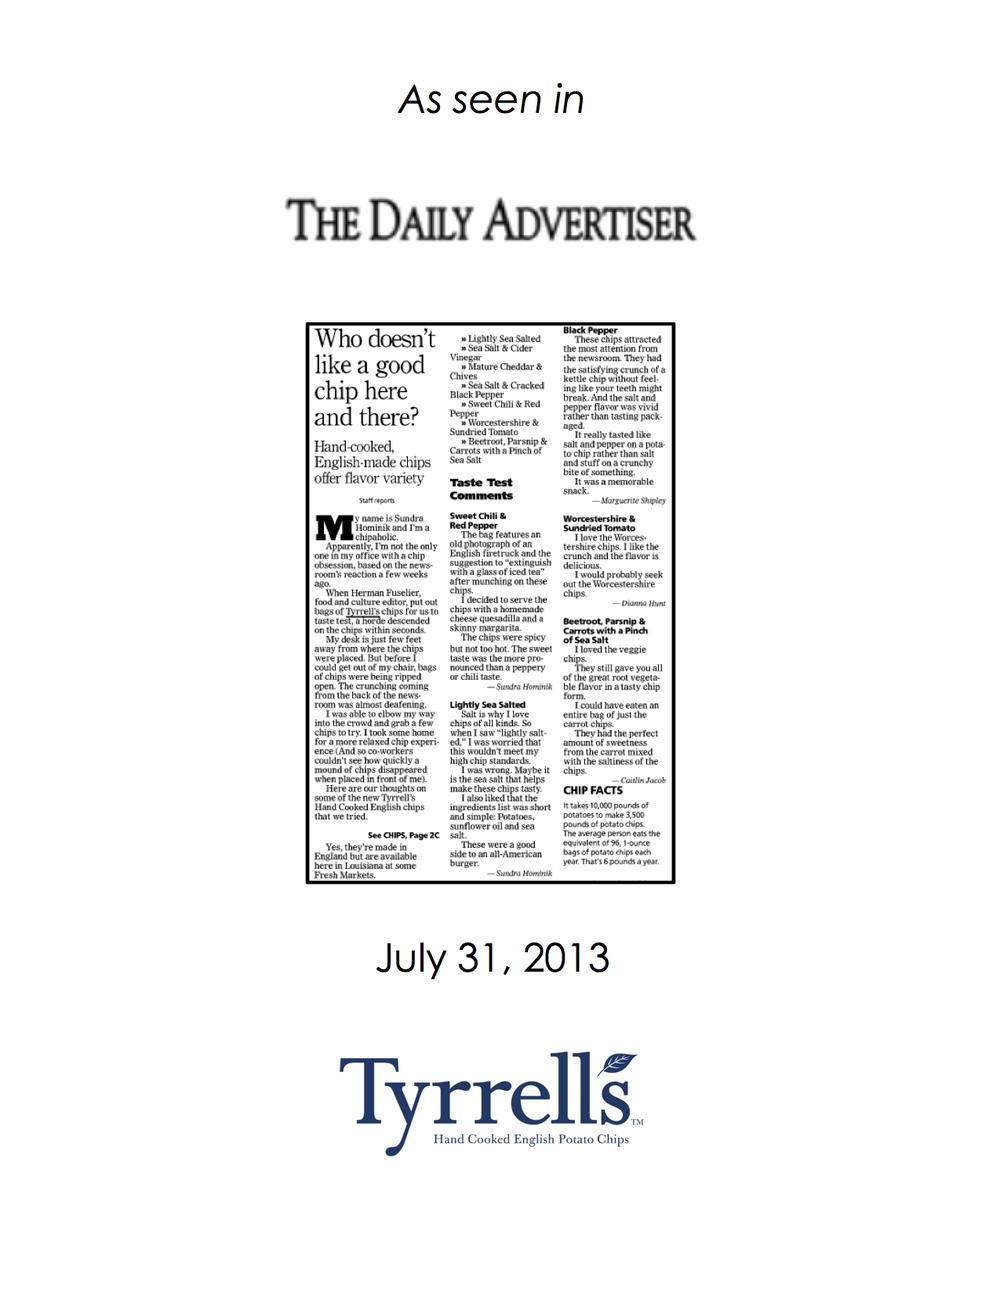 tyrrells-asseenin-dailyadvertiser copy.jpg